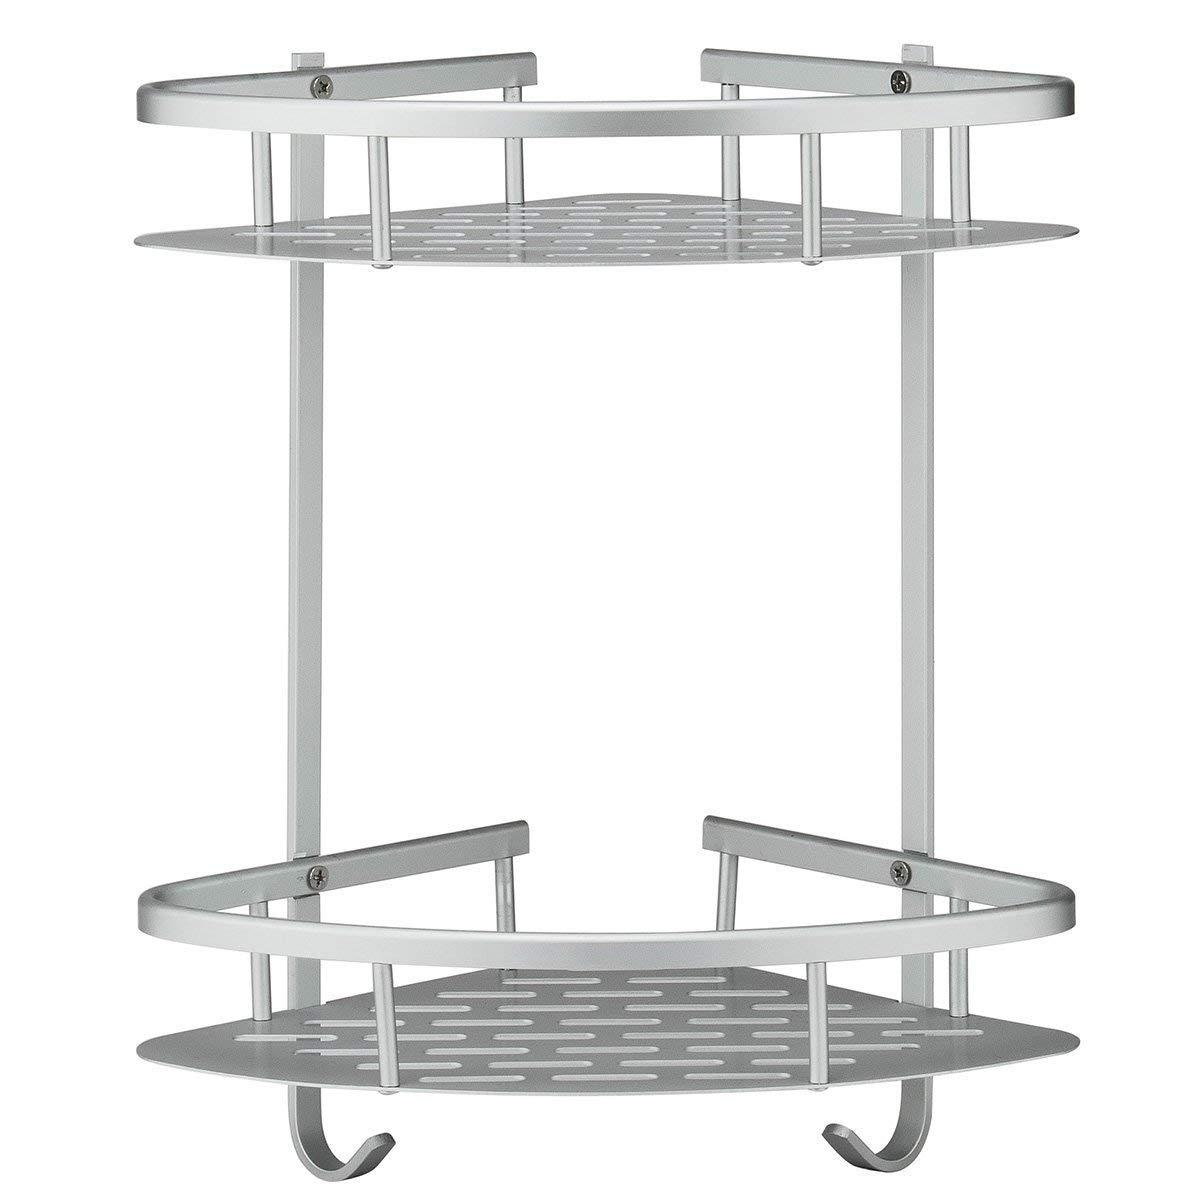 Shelf No Drilling, Durable Aluminum 2 Tiers Shower Storage Caddy Towel Bar Basket Kitchen Corner Sticky No Drills Shelves, C-GJ5 (Set 1) CXI Online Store